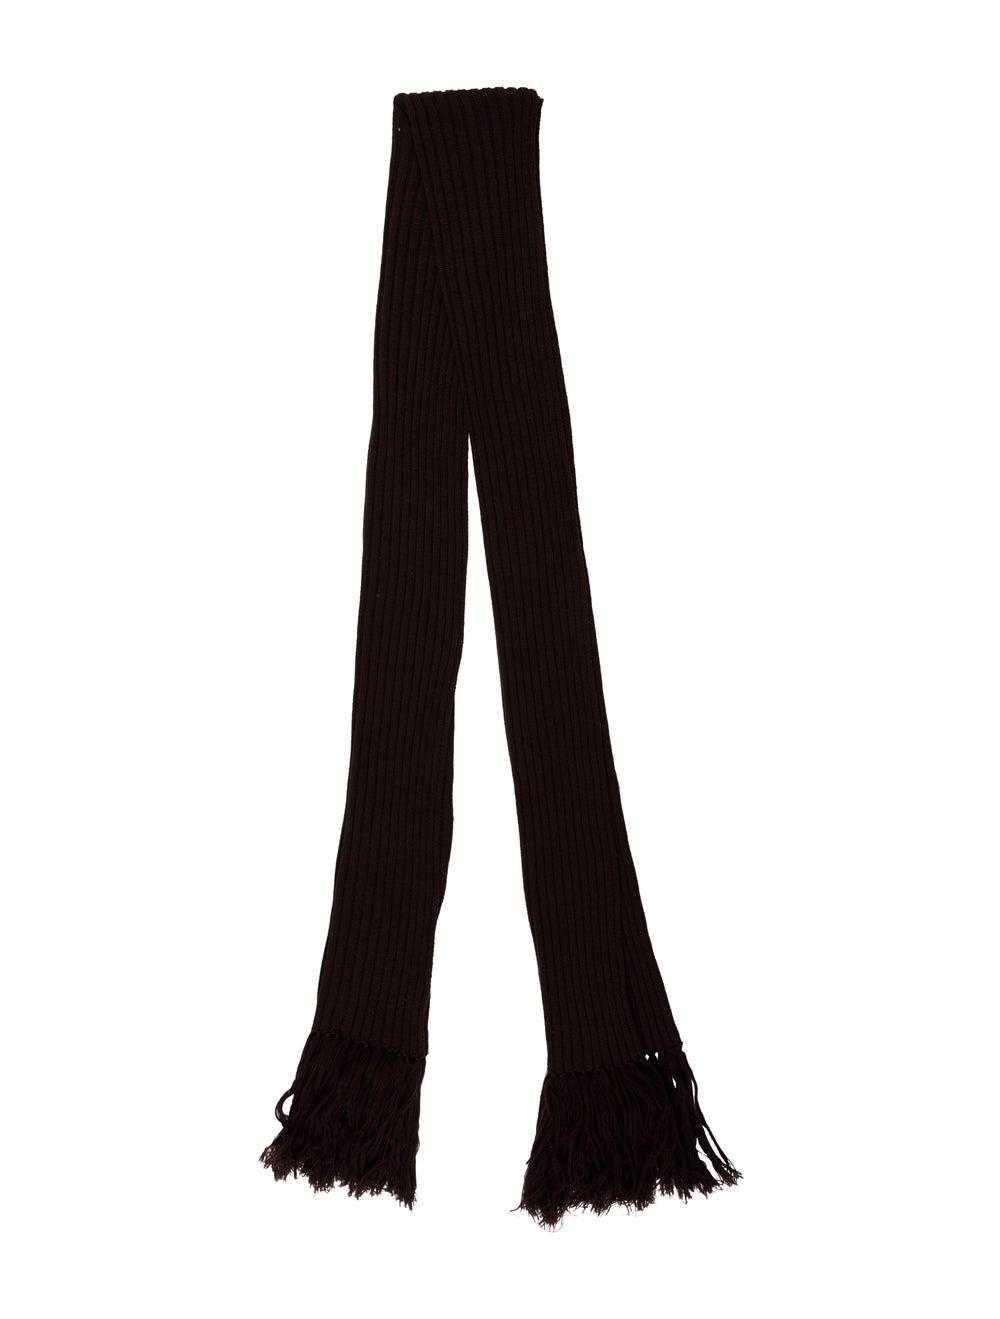 Dolce & Gabbana Knit Fringe Scarf Brown - image 1